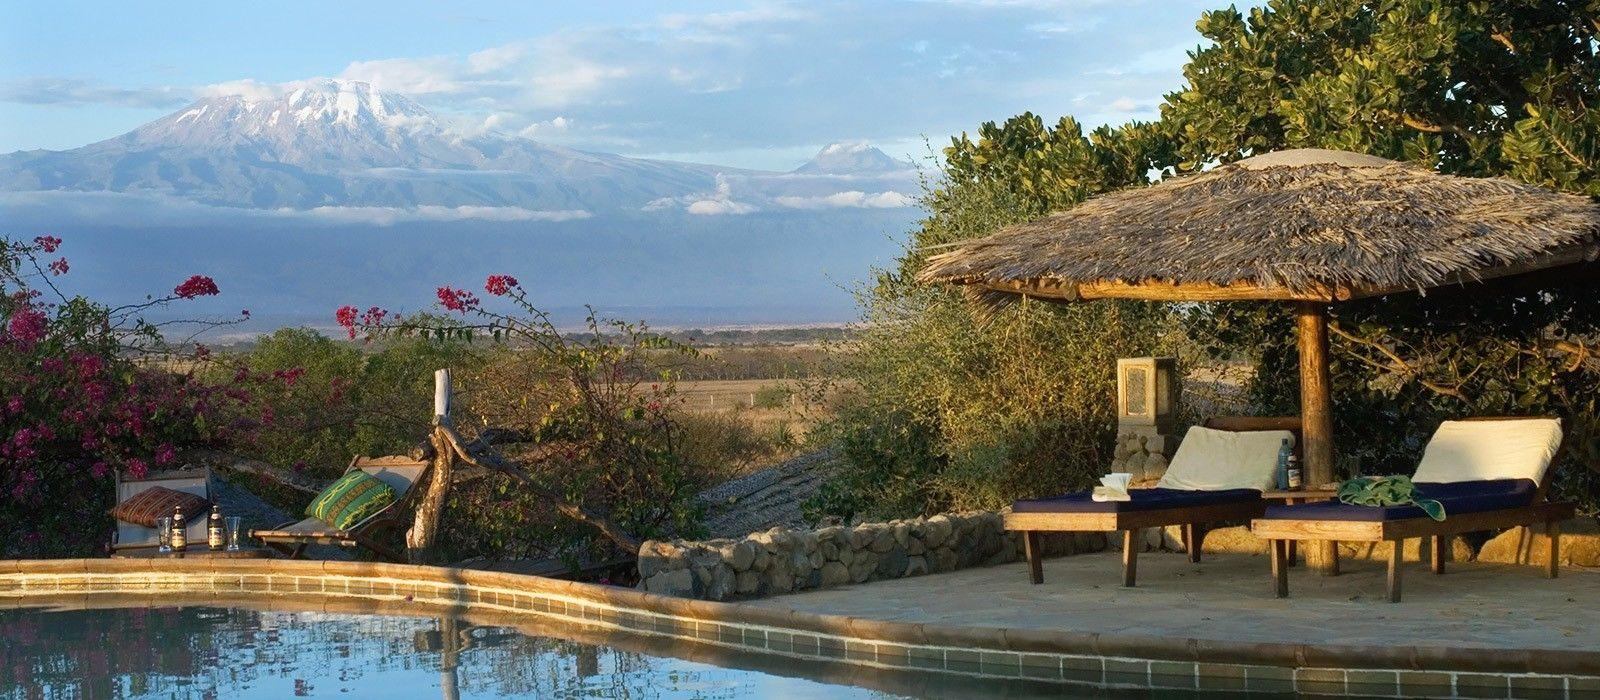 Ruanda & Tansania – Gorilla Tracking & geheimnisvolles Sansibar Urlaub 3